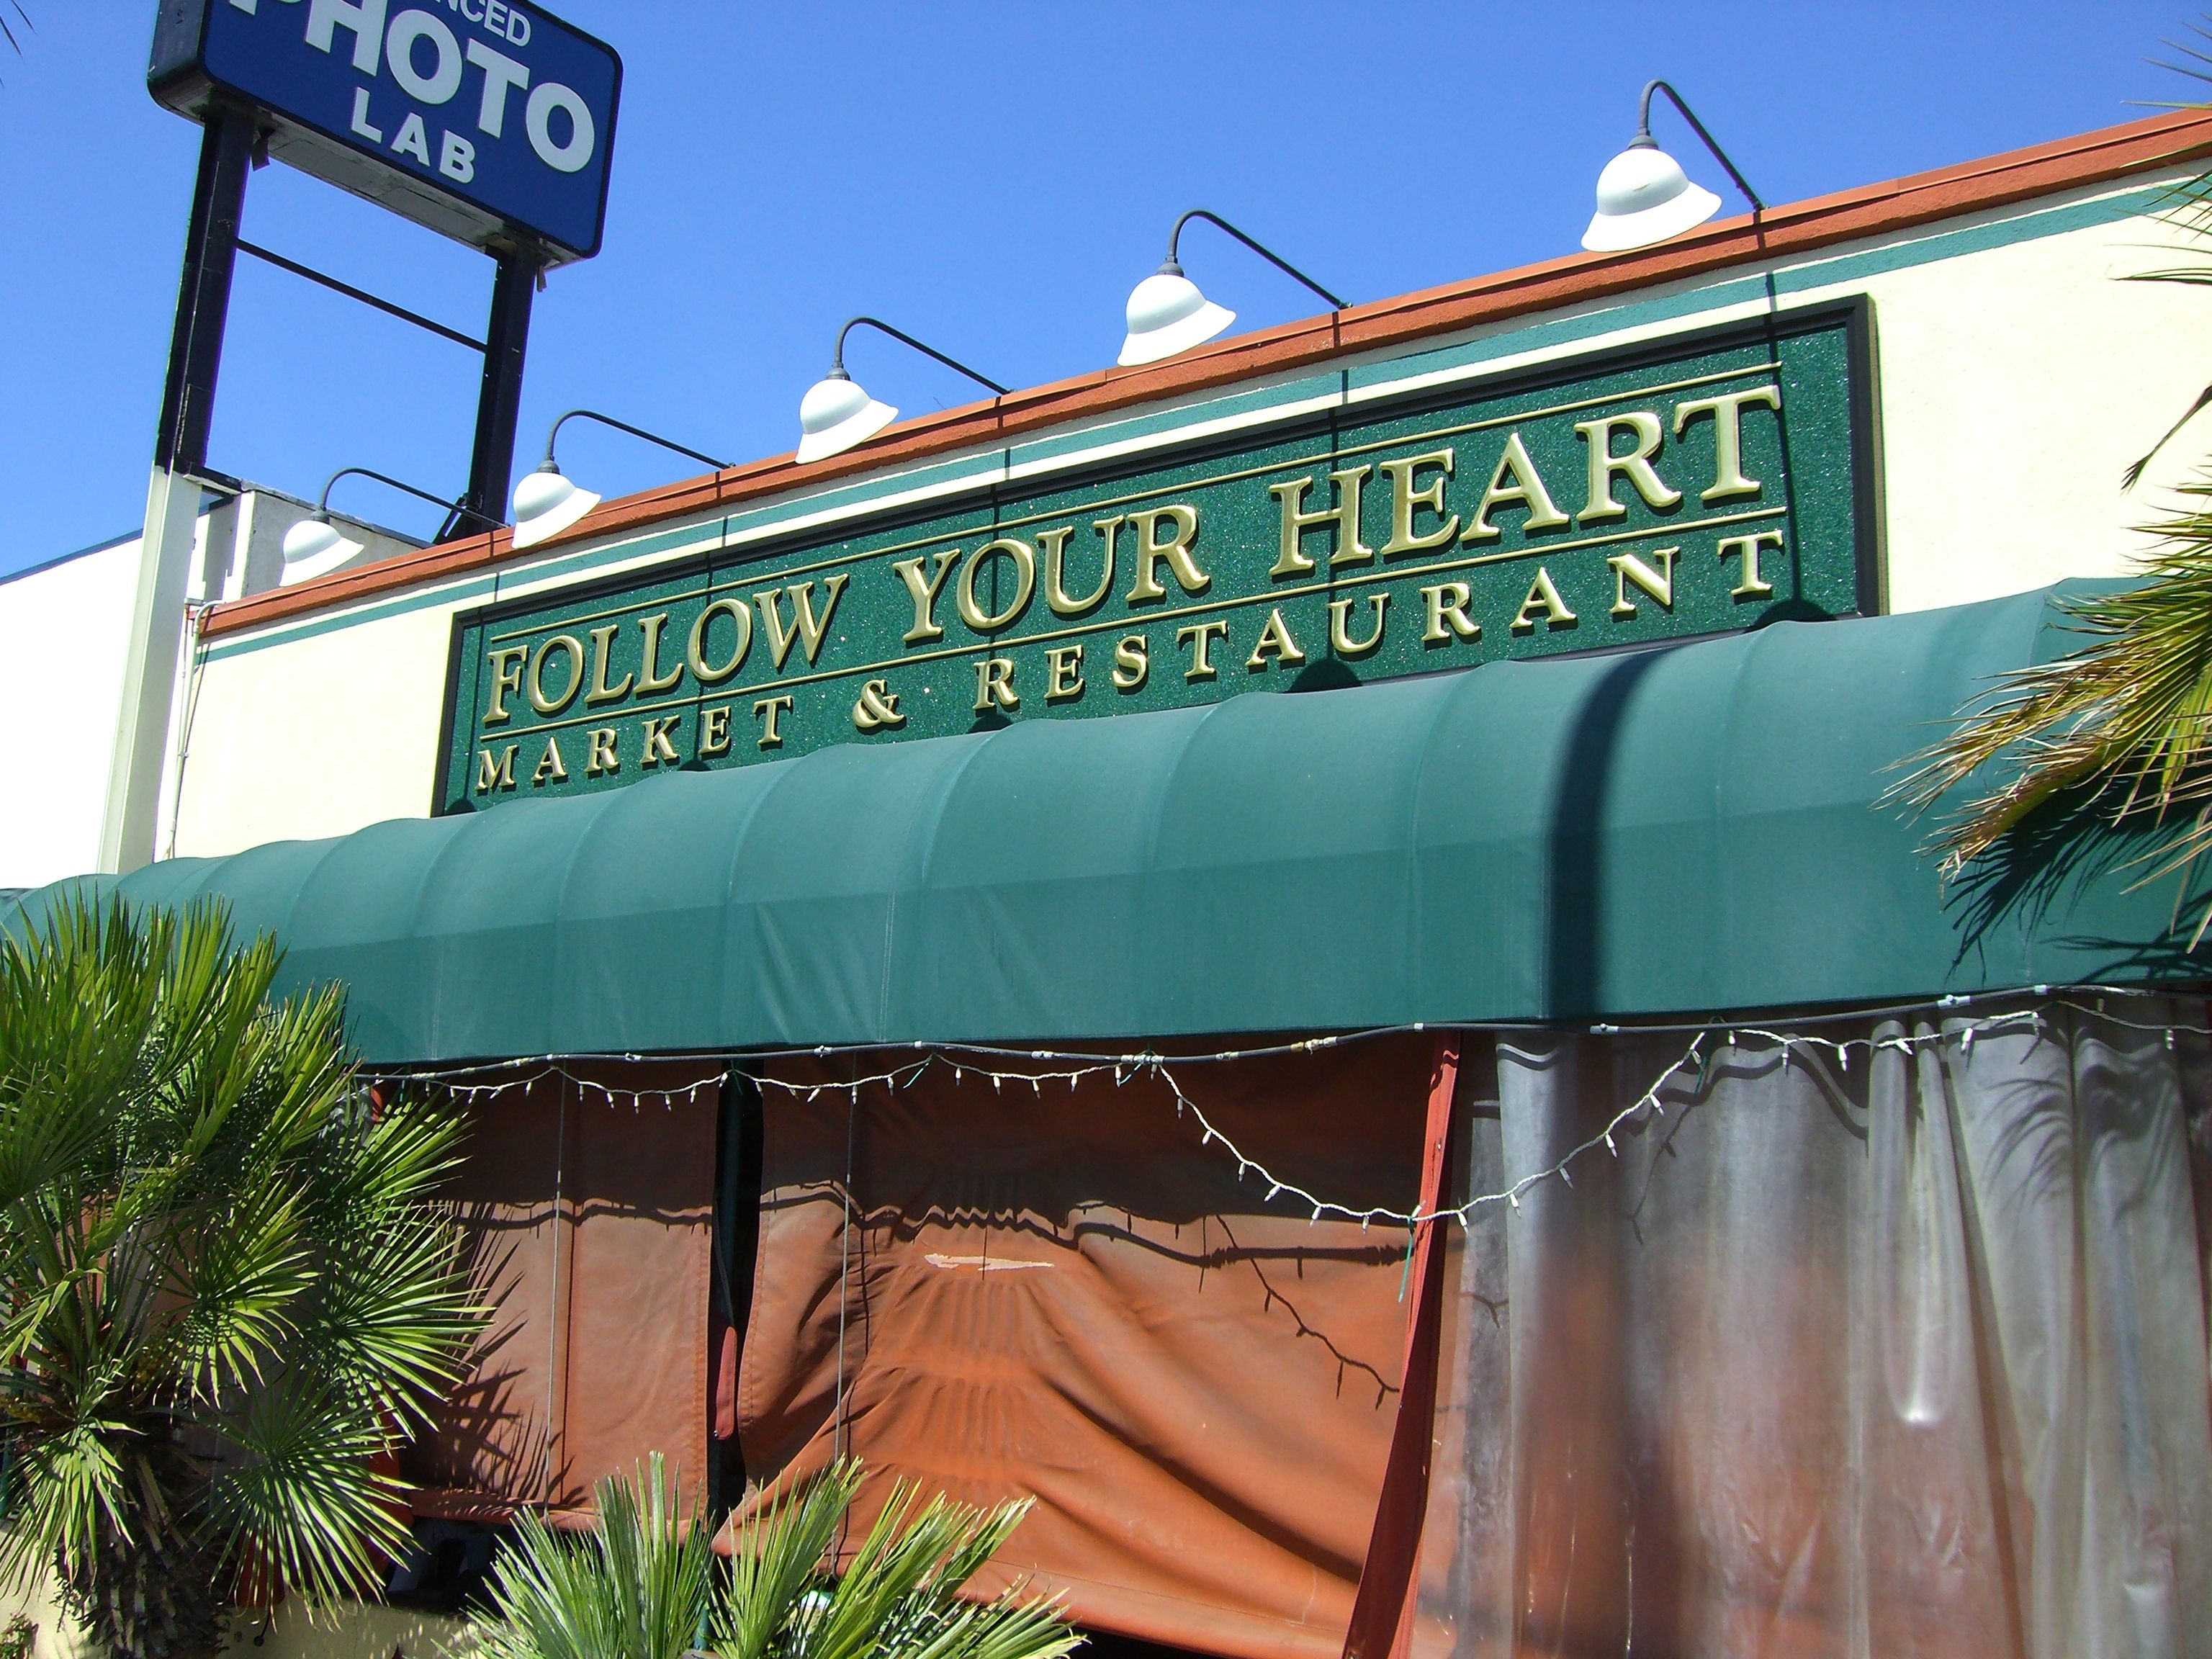 Follow Your Heart Cafe